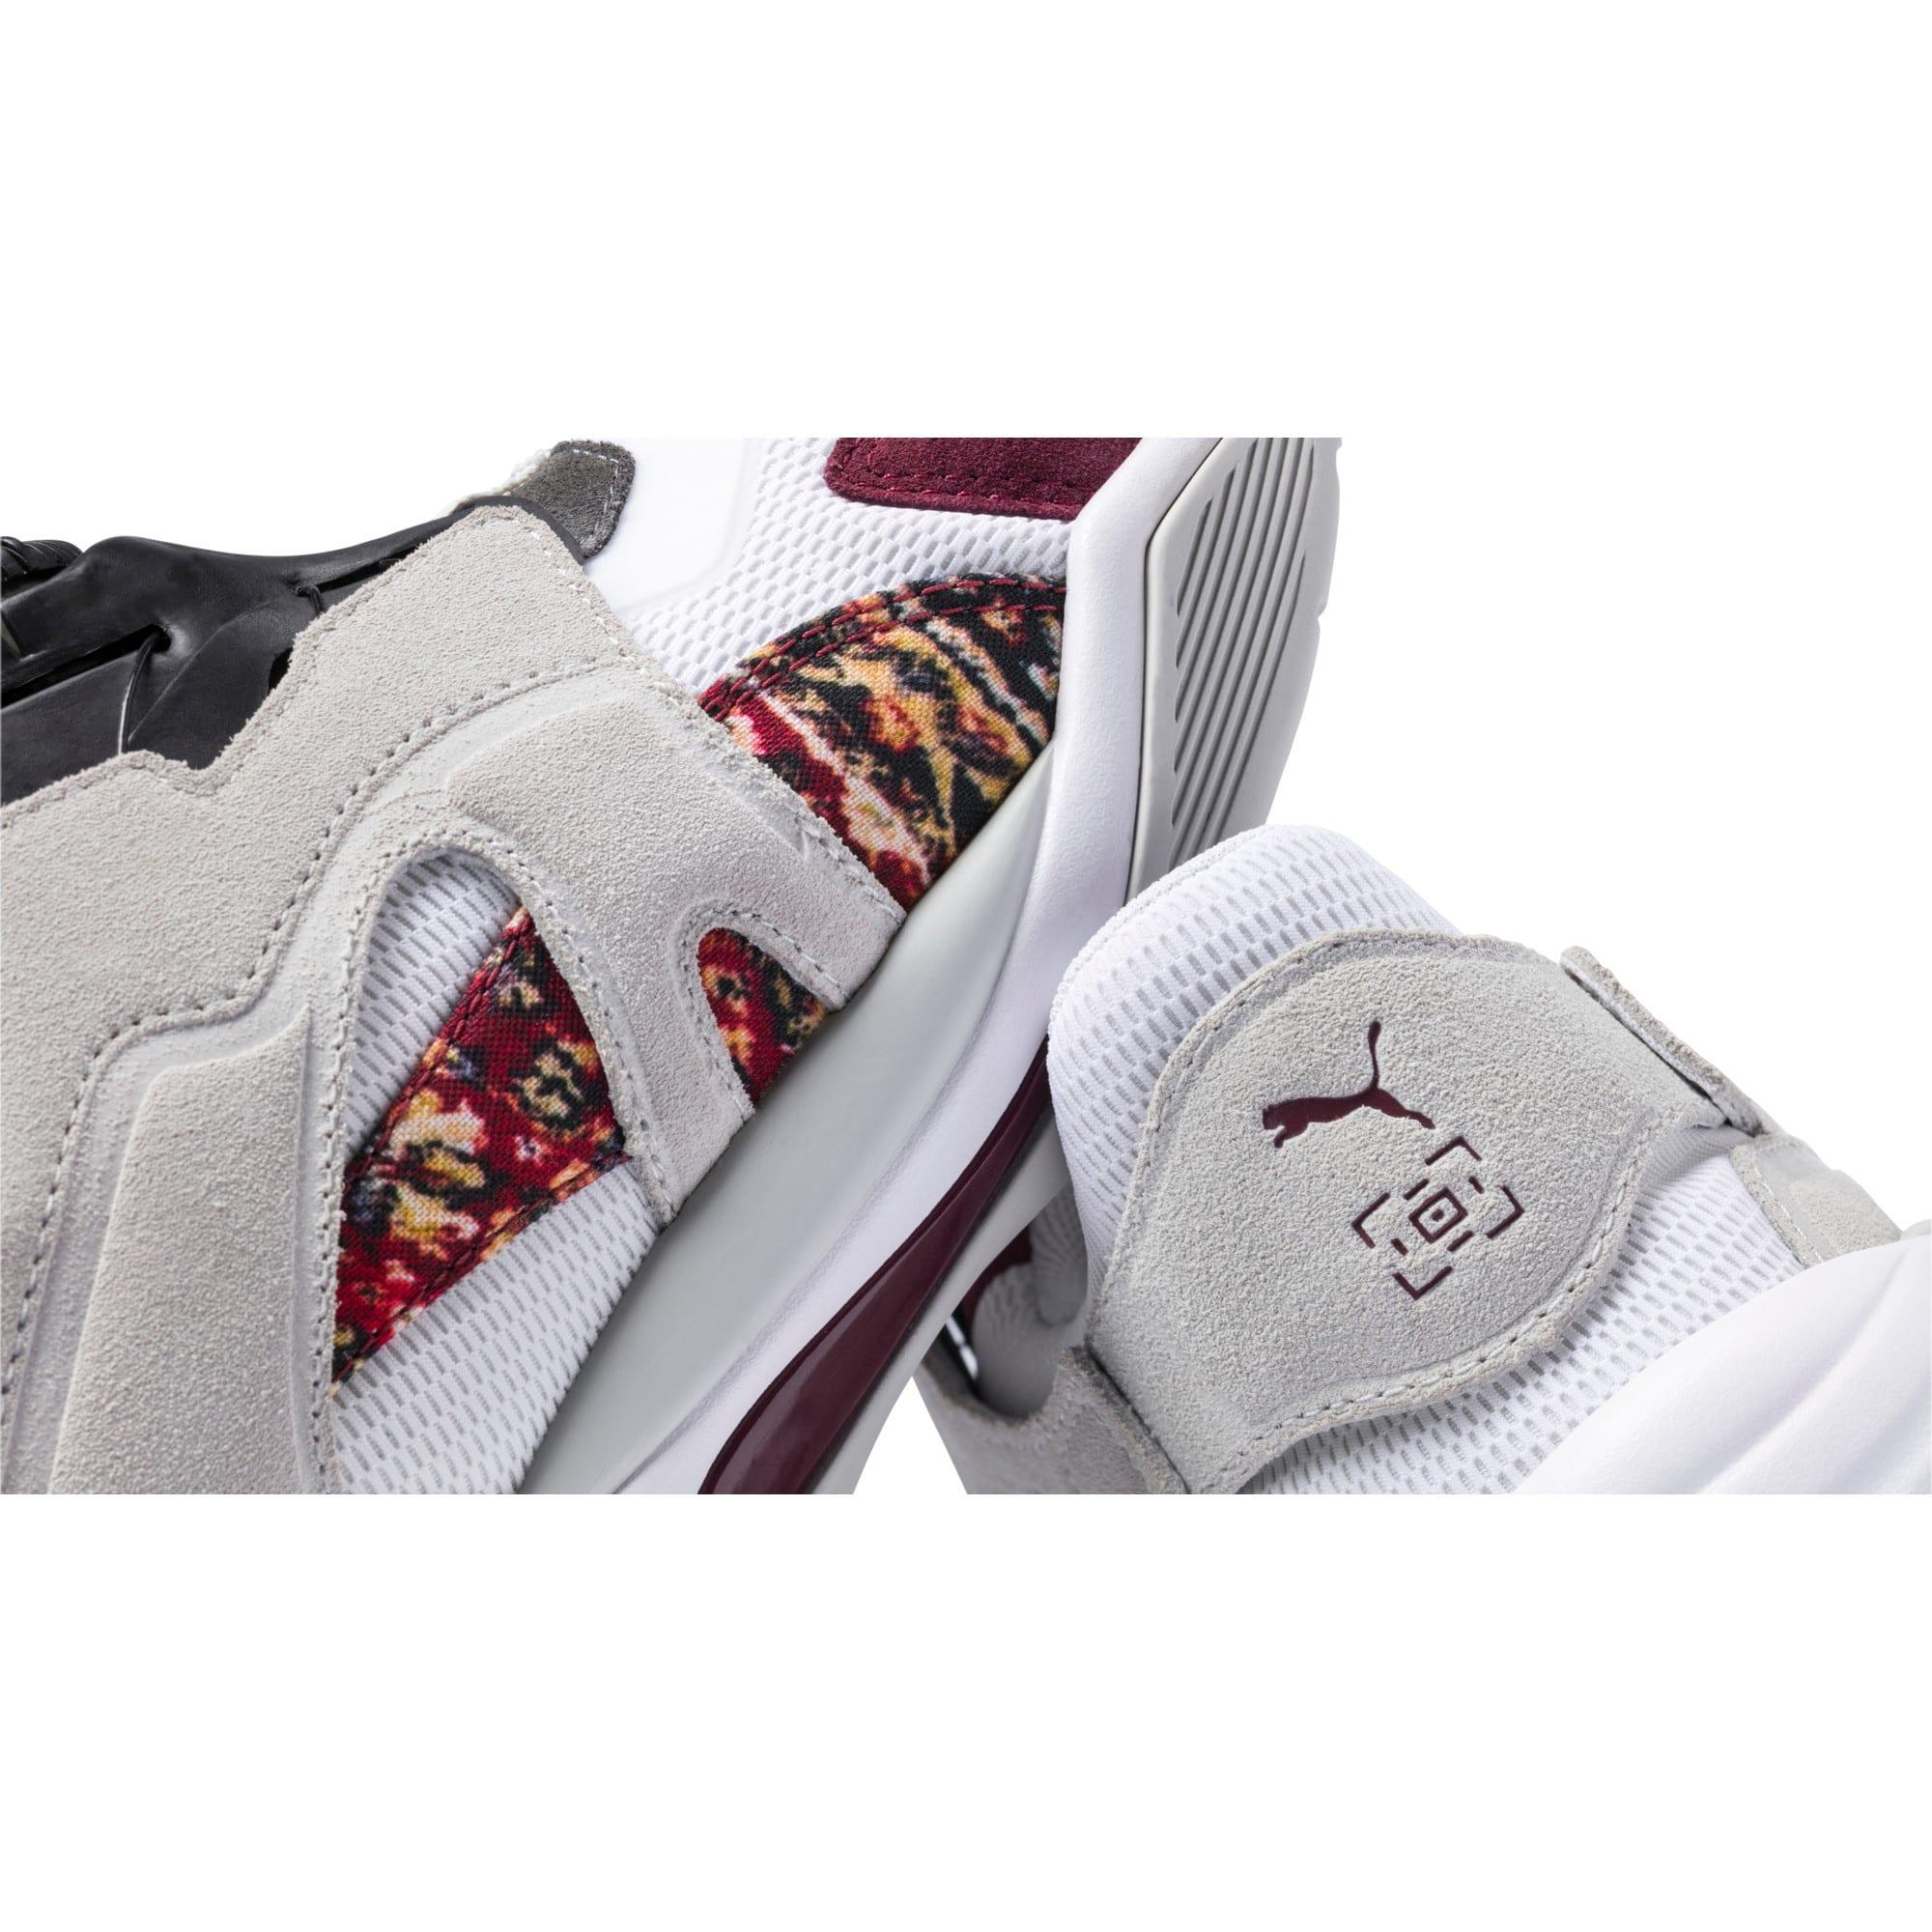 Thumbnail 9 of PUMA x LES BENJAMINS Thunder DISC Men's Sneakers, Puma White-Glacier Gray, medium